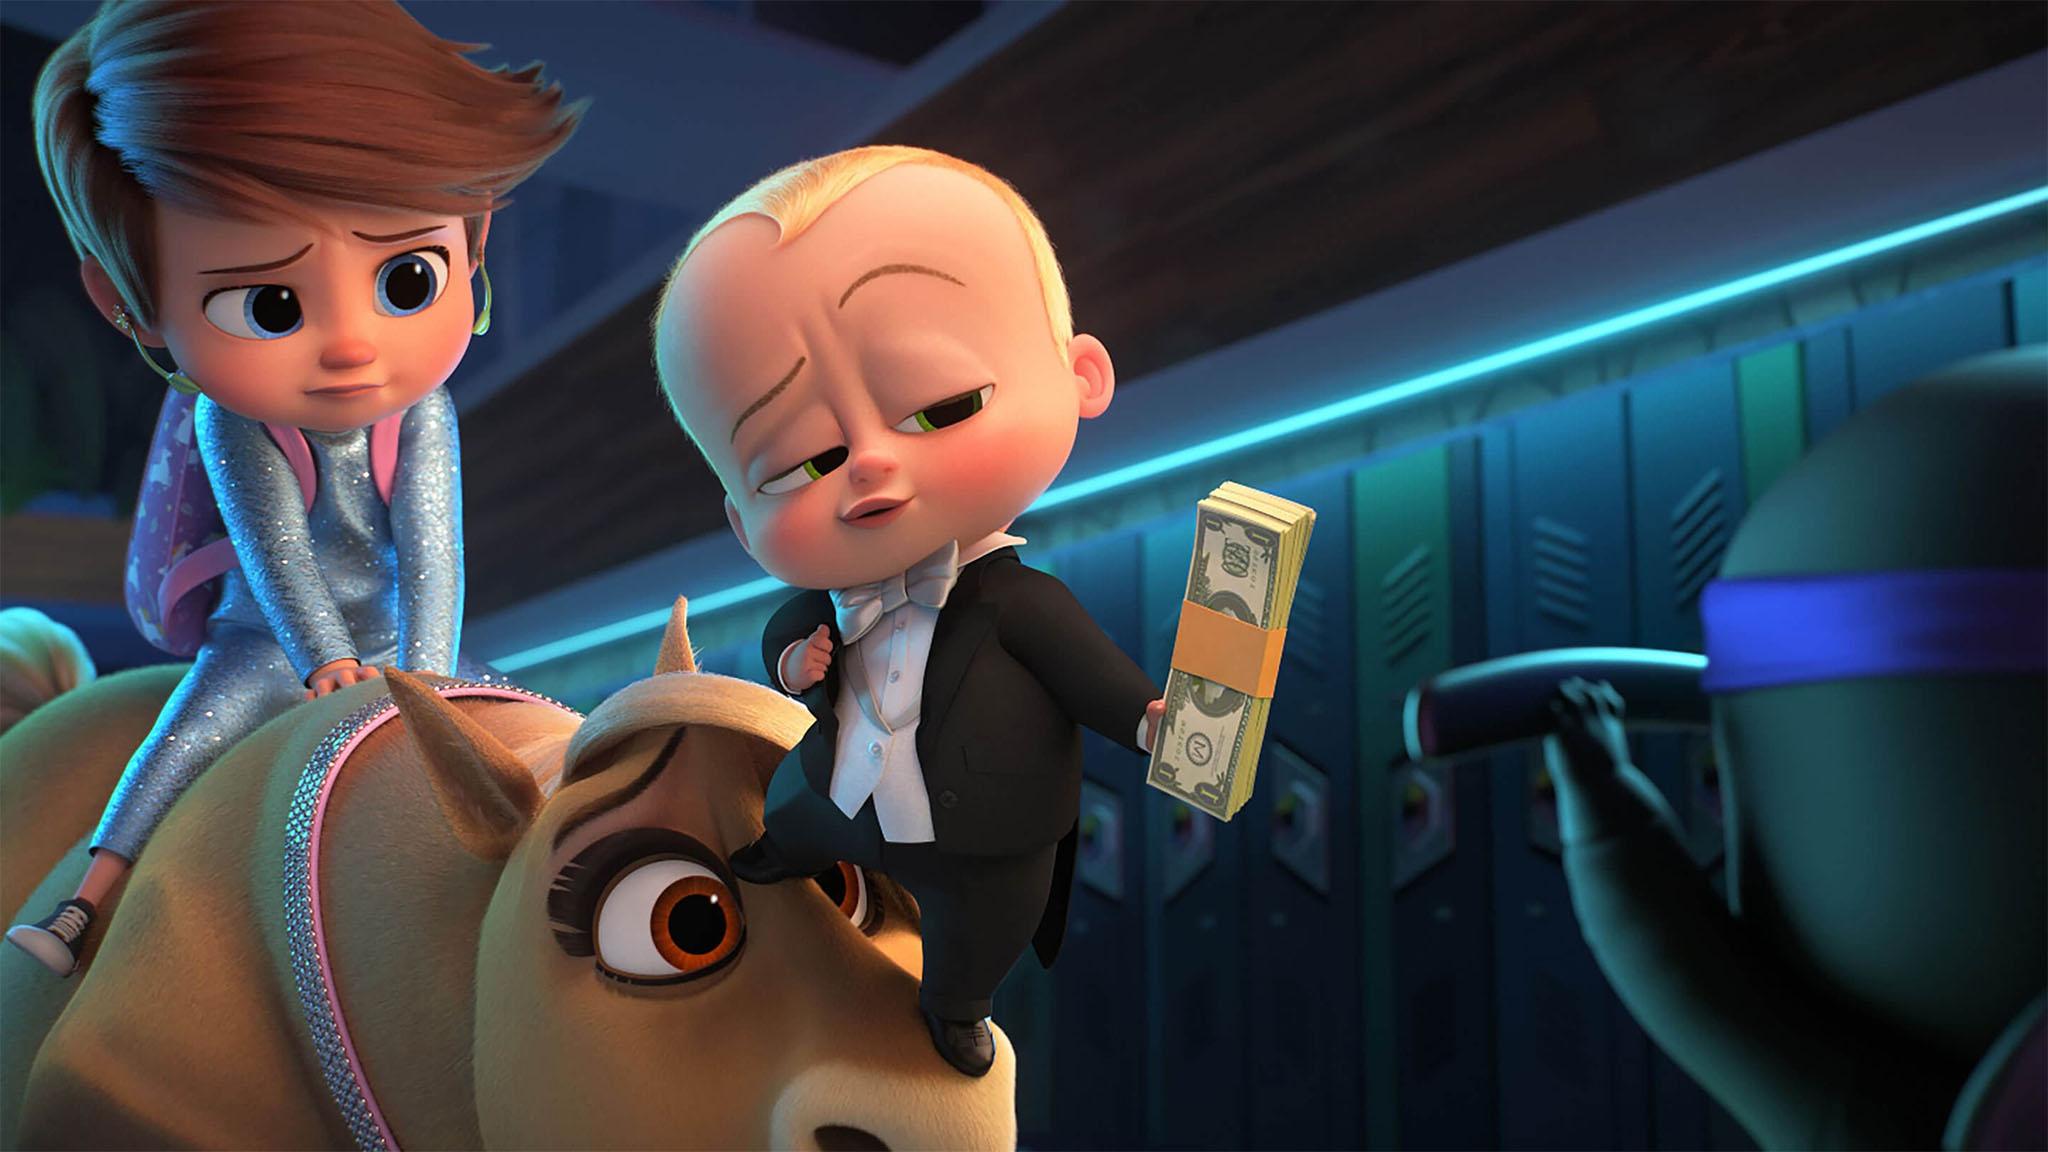 فيلم The Boss Baby: Family Business 2021 مترجم